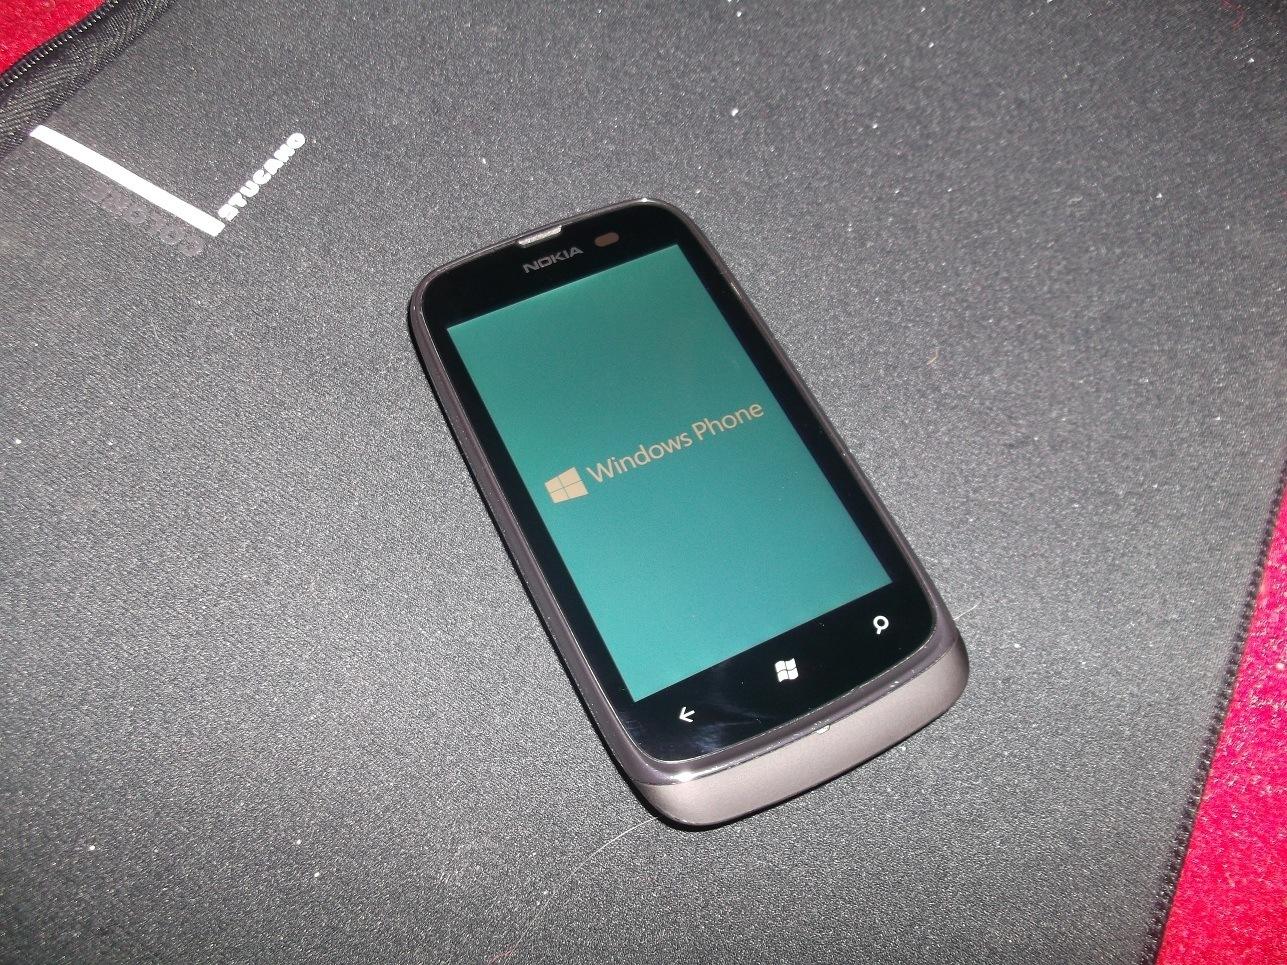 lumia 610 bootscreen